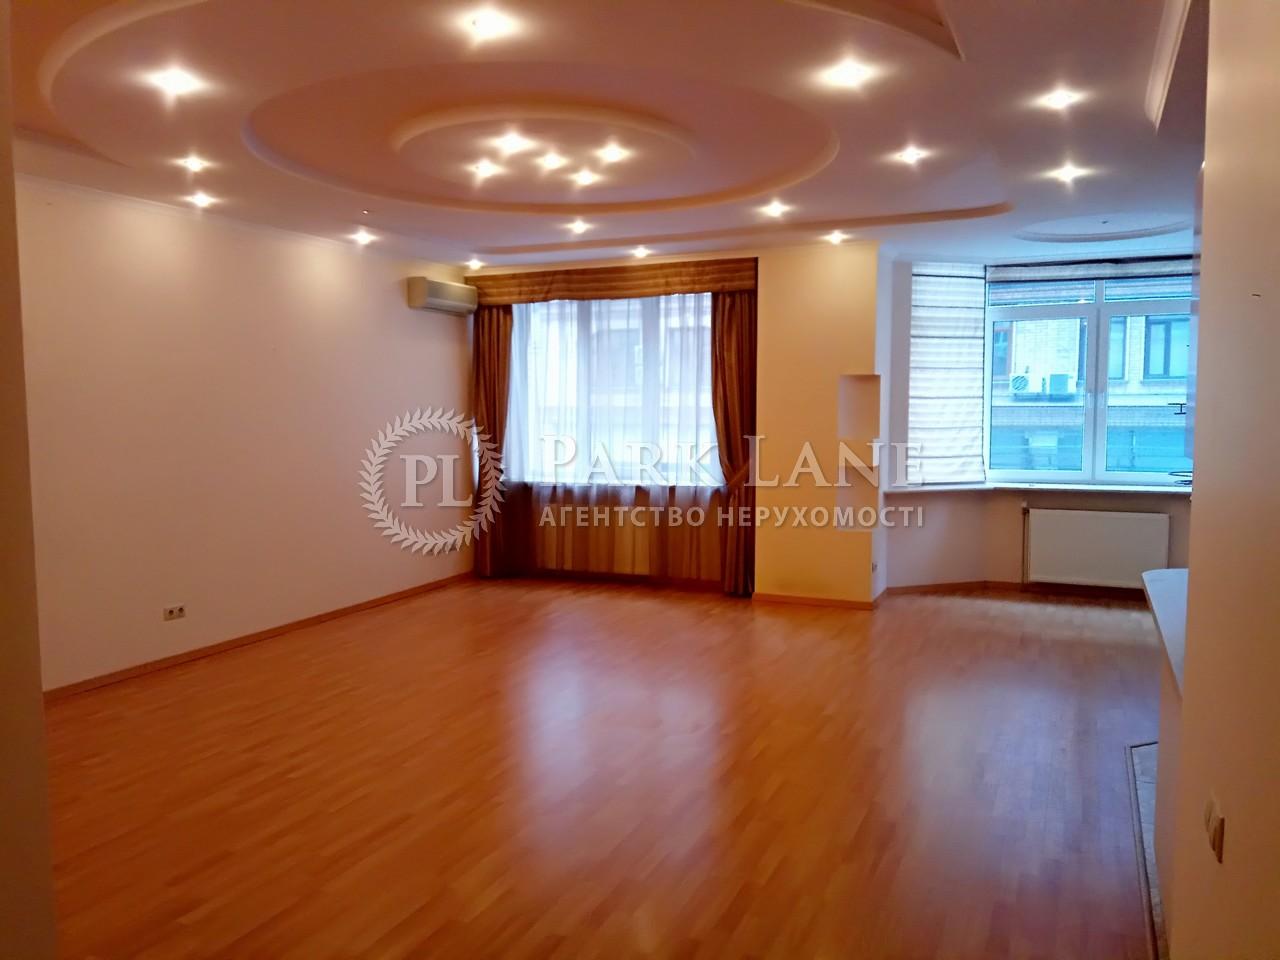 Квартира ул. Павловская, 17, Киев, R-26078 - Фото 3